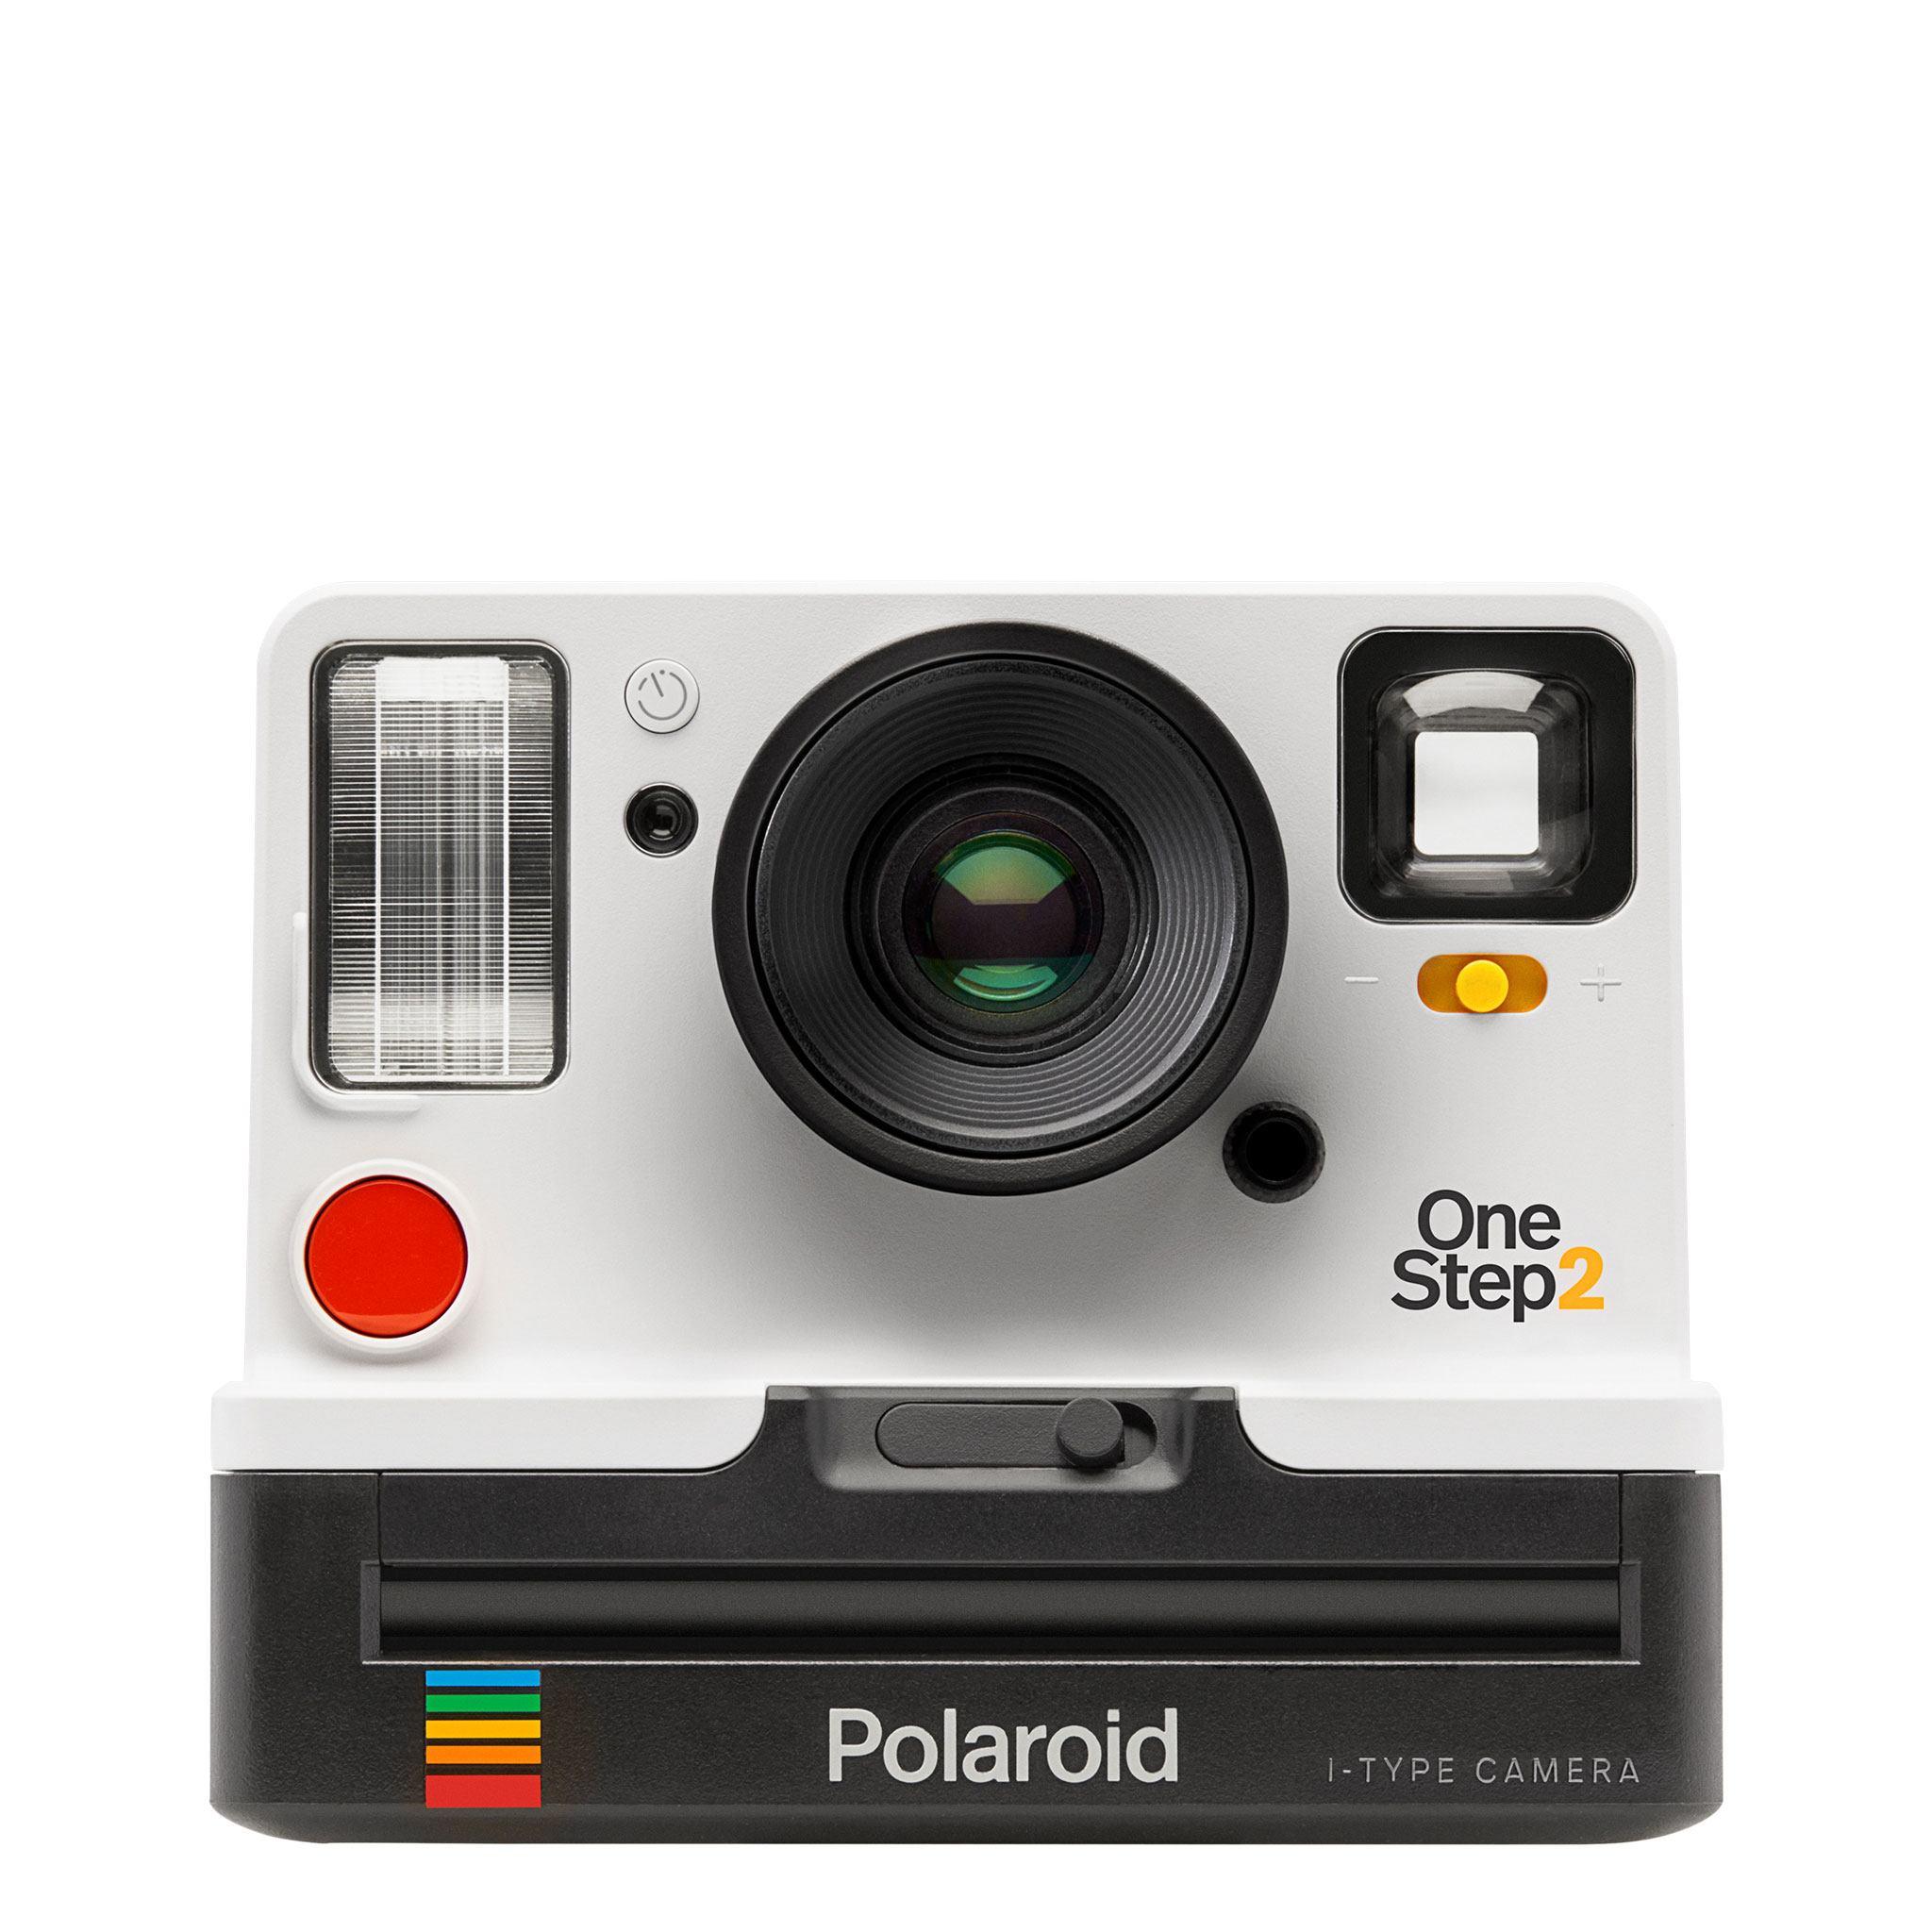 white-onestep2-polaroid-camera-009003-front.jpg